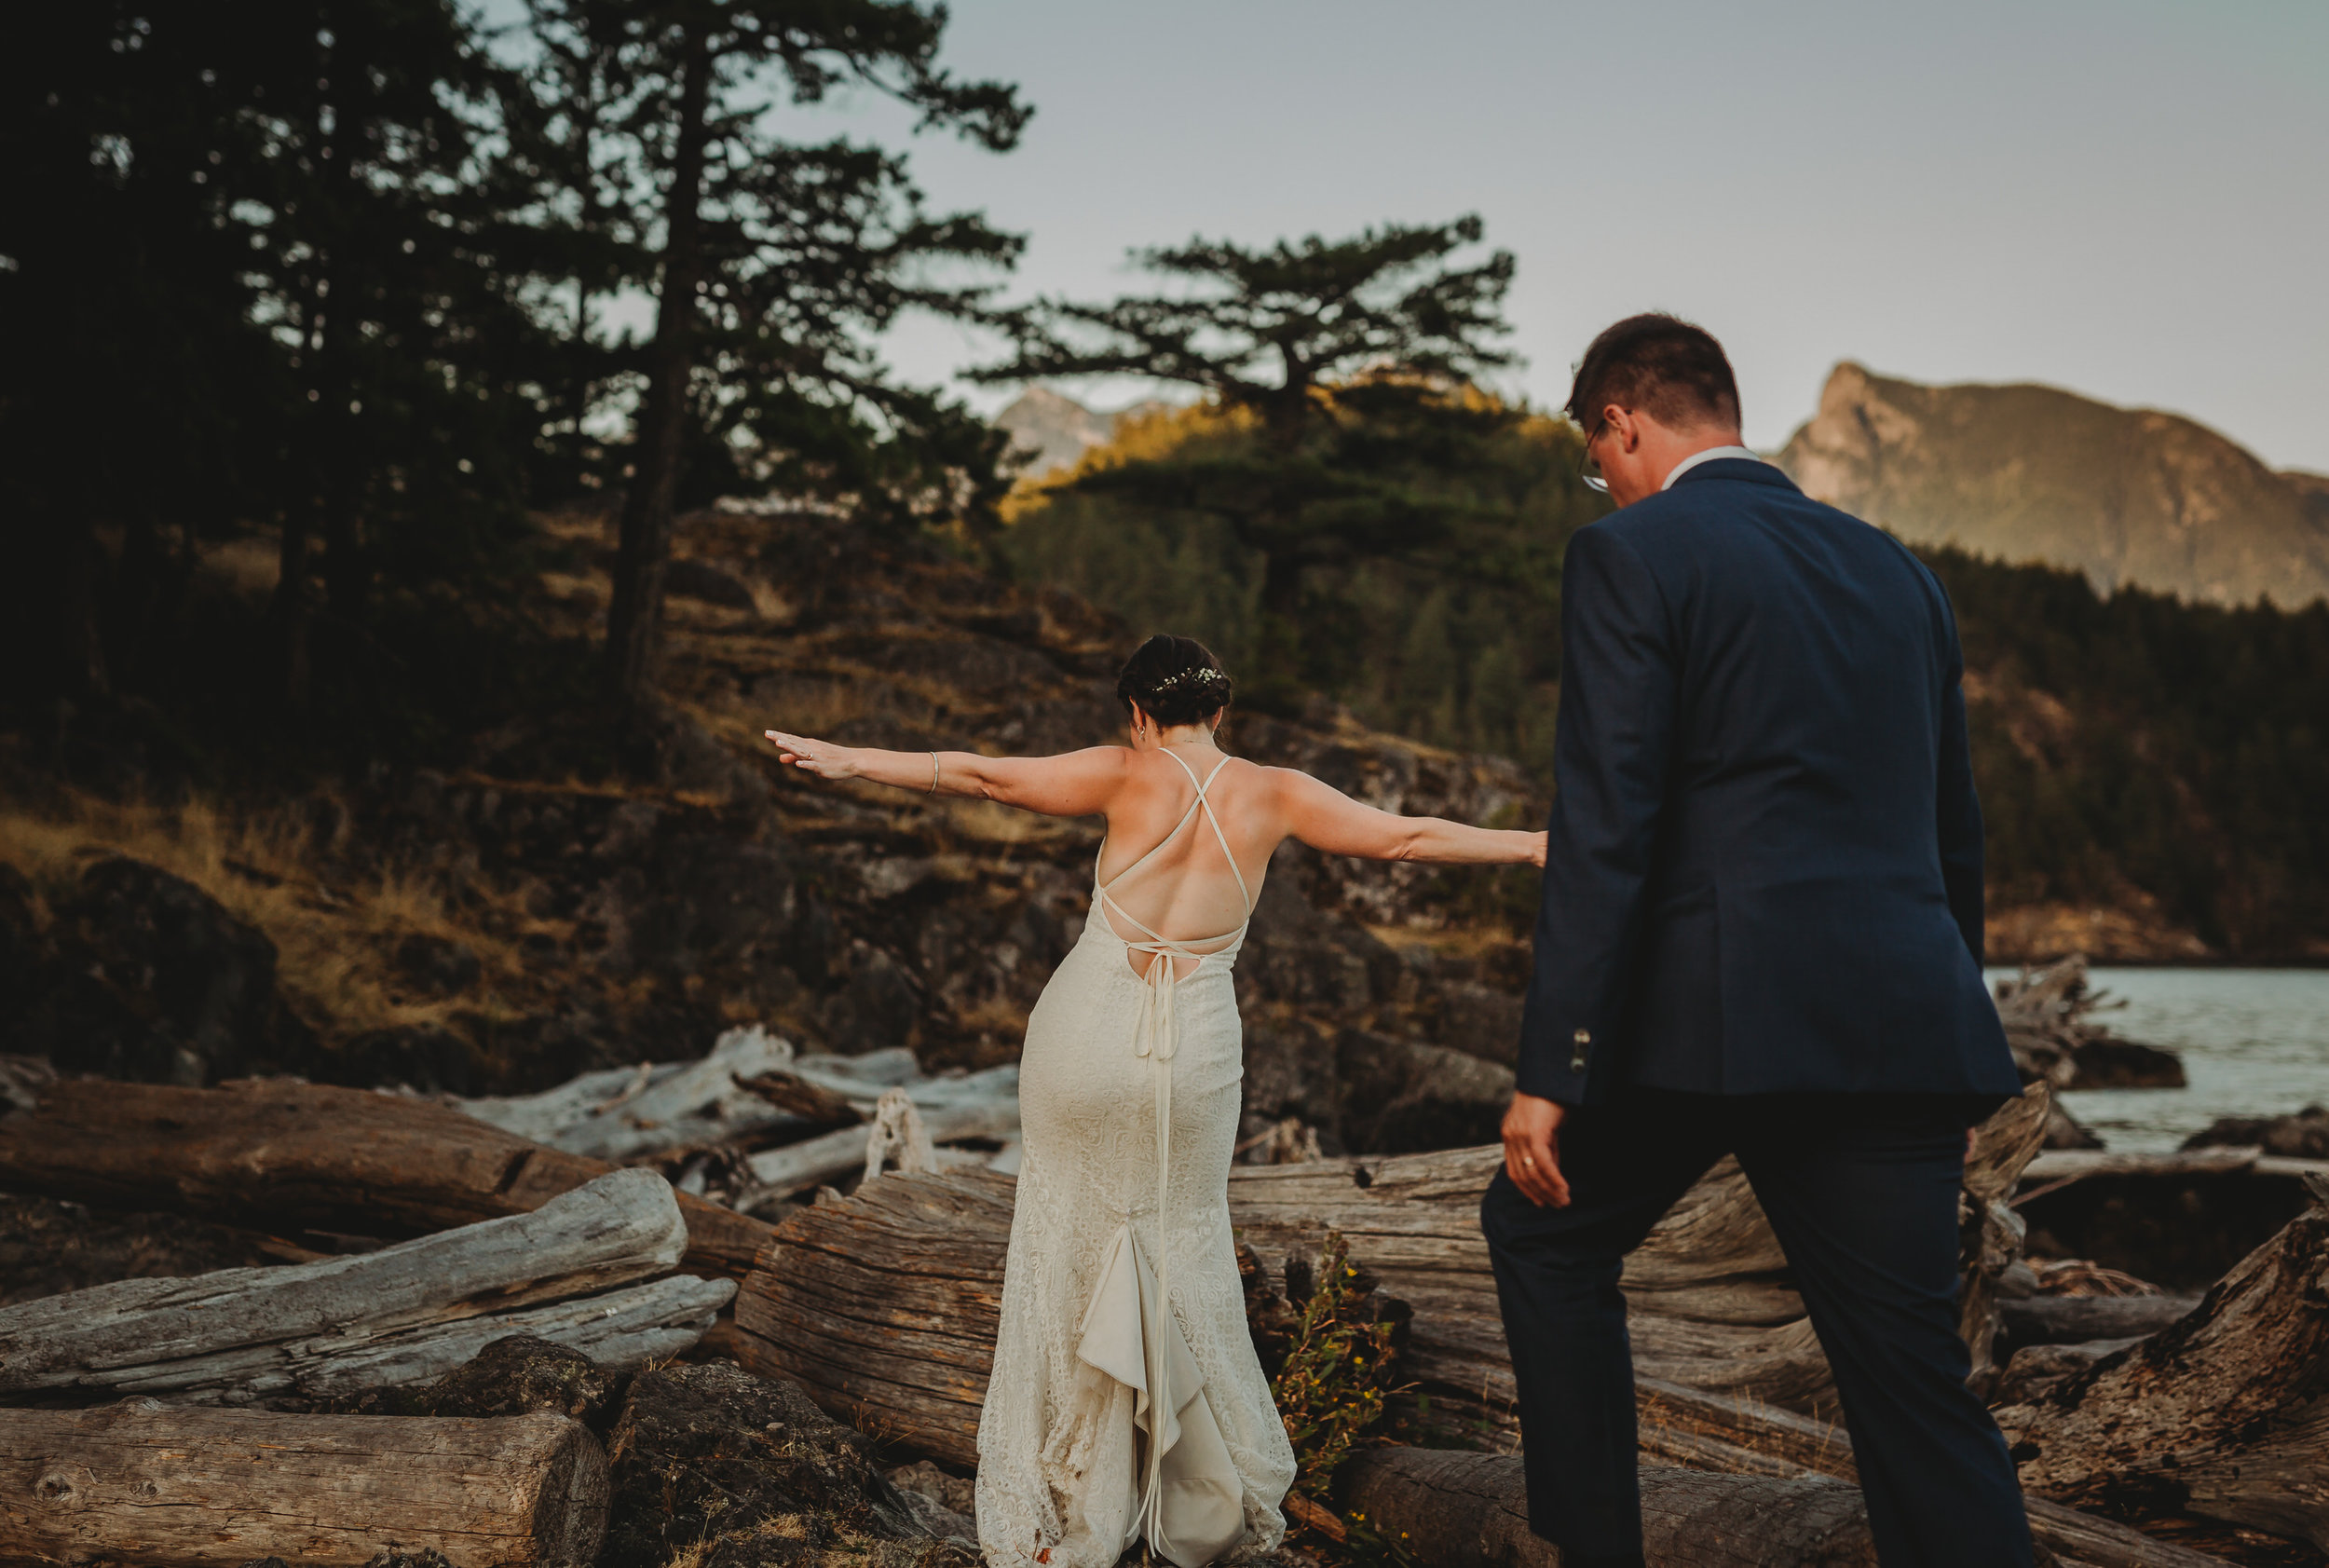 Camp Fircom Wedding - Vancouver Wedding Photographer & Videographer - Sunshine Coast Wedding Photos - Sunshine Coast Wedding Photographer - Jennifer Picard Photography - IMG_1484.jpg